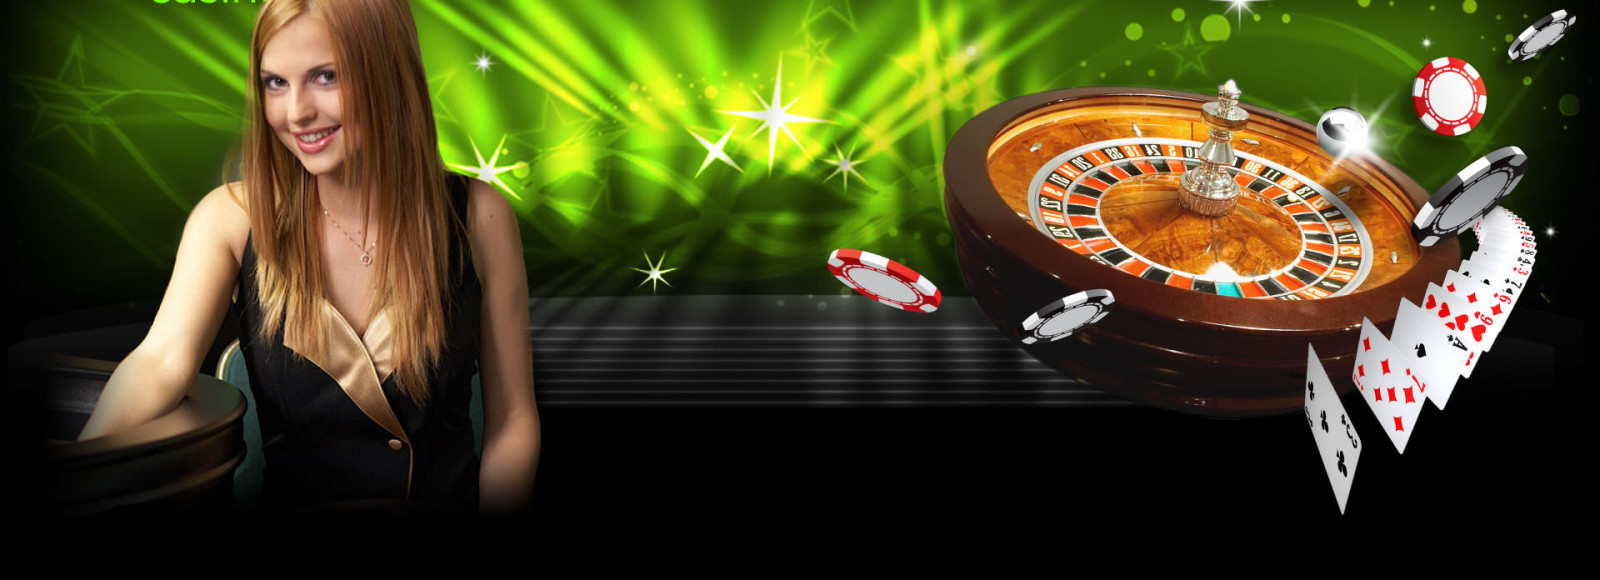 Online casino bonus auszahlen lassen